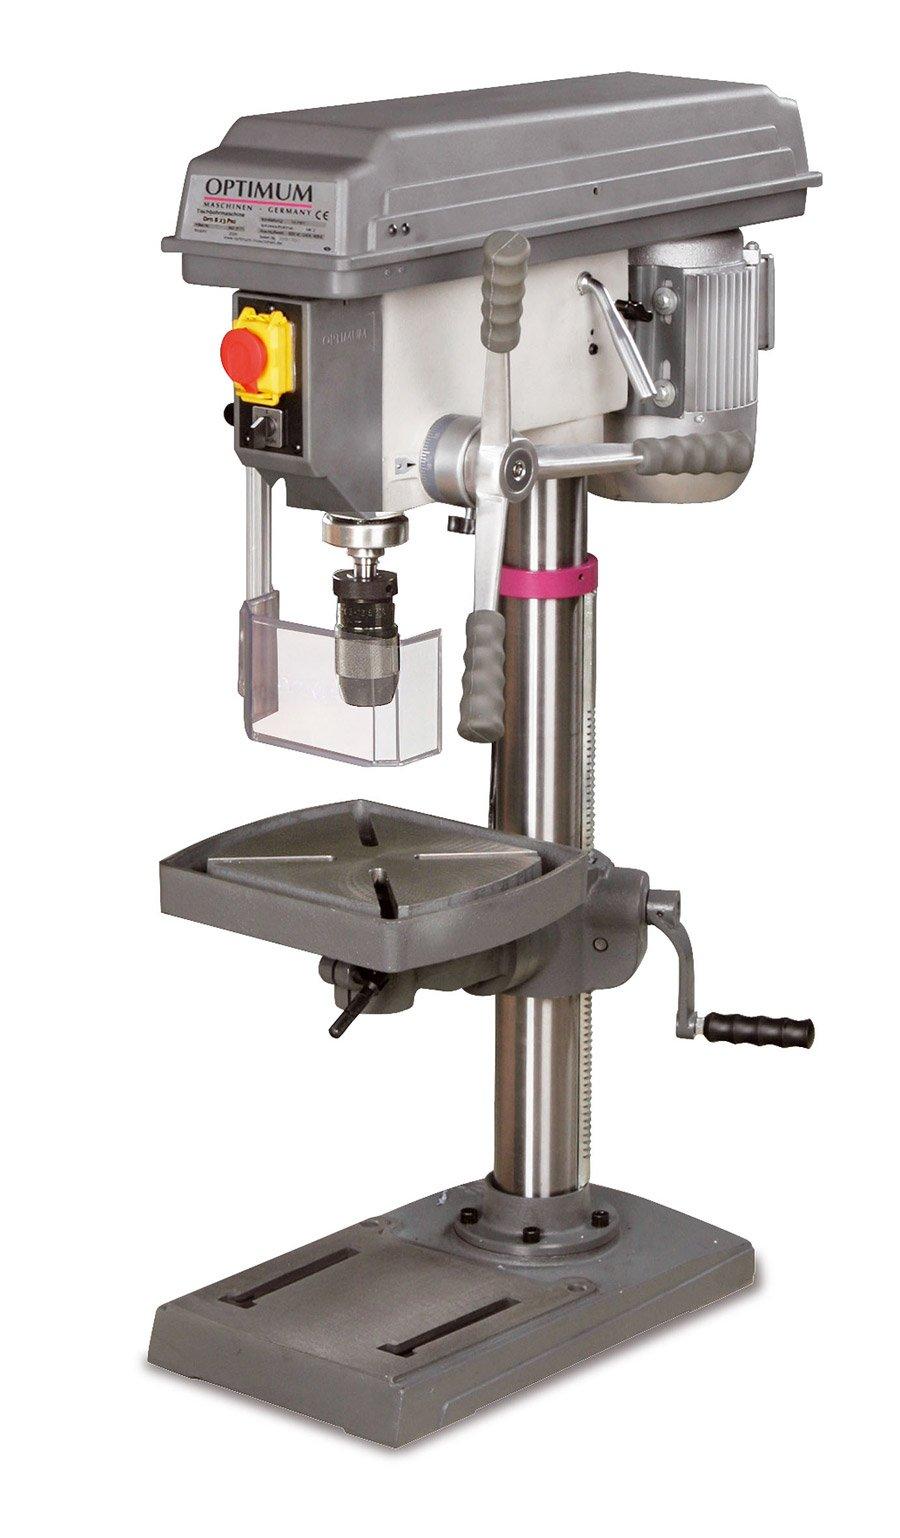 Tischbohrmaschine-OPTI-B23Pro-400V